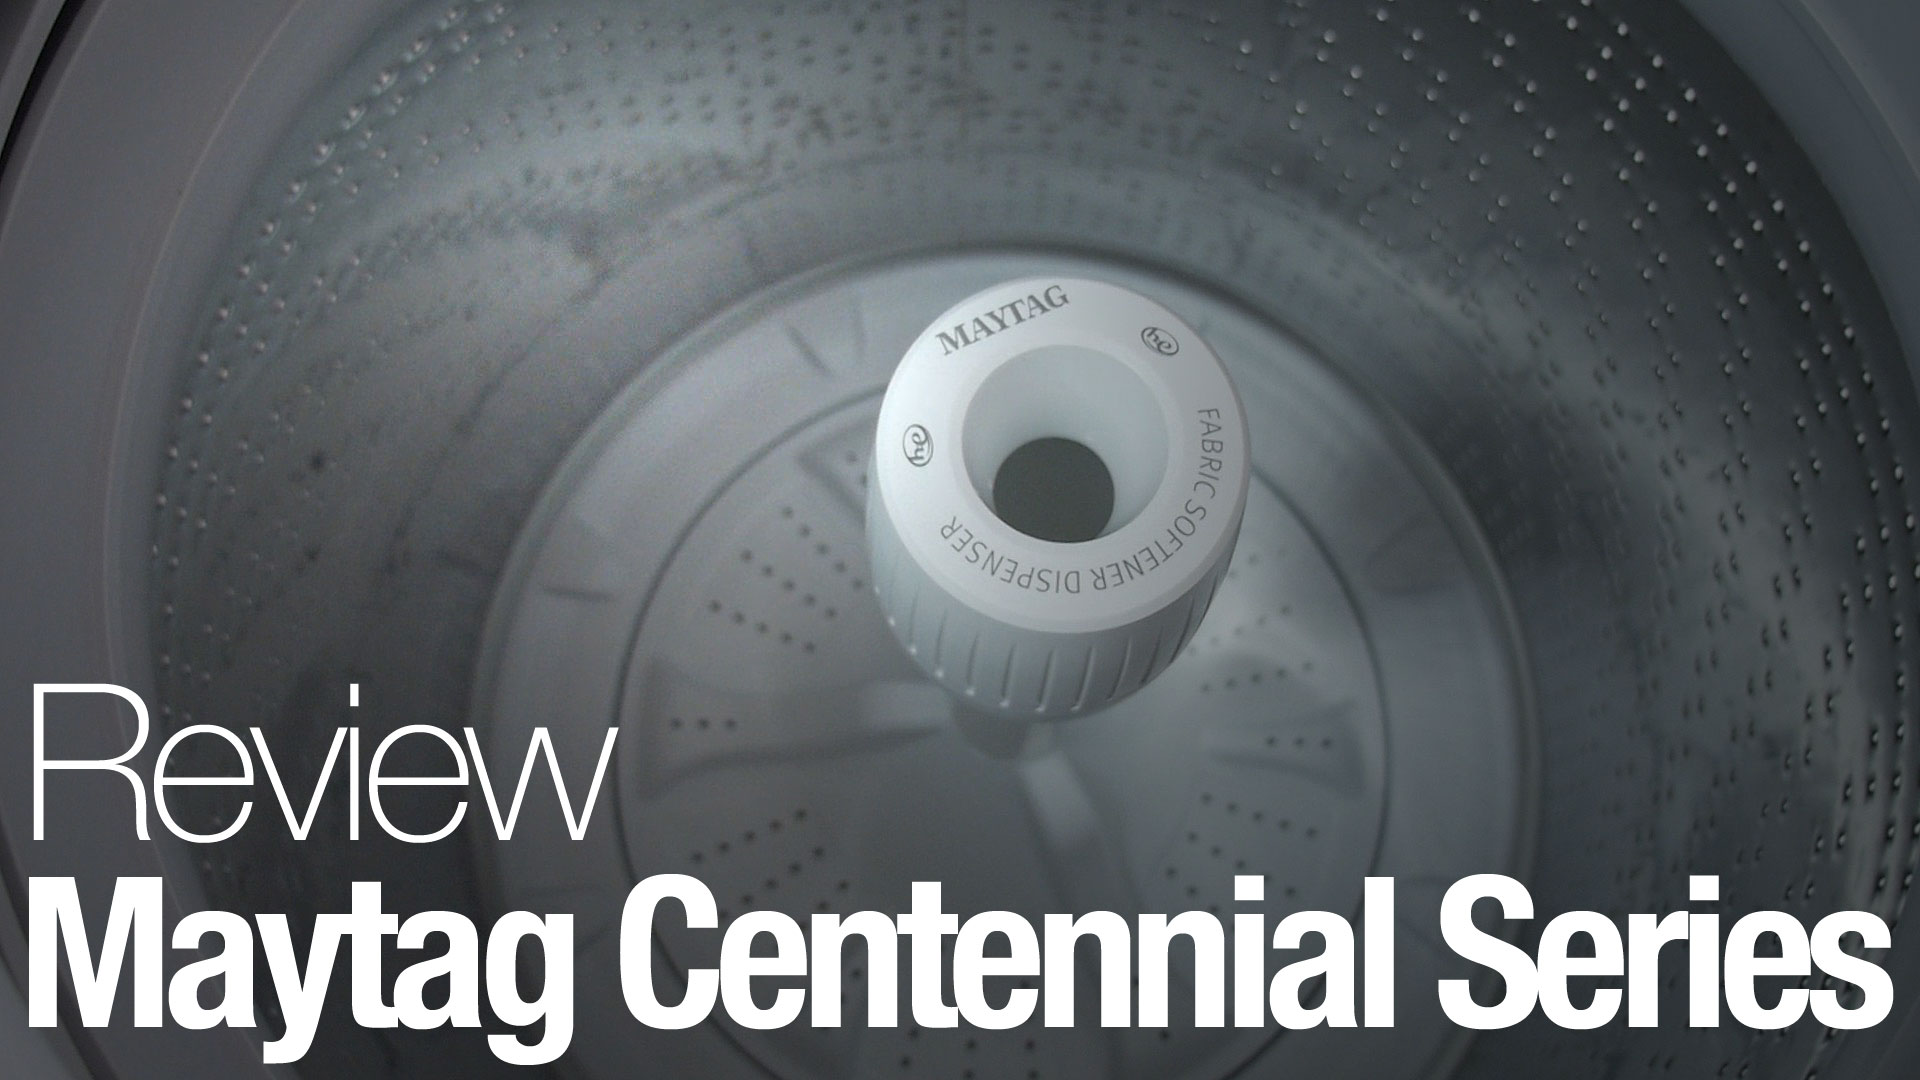 Maytag Centennial Mvwc415ew Washing Machine Review Electric Gas Dryer Tumbler Parts Model Mdg9316aww Laundry